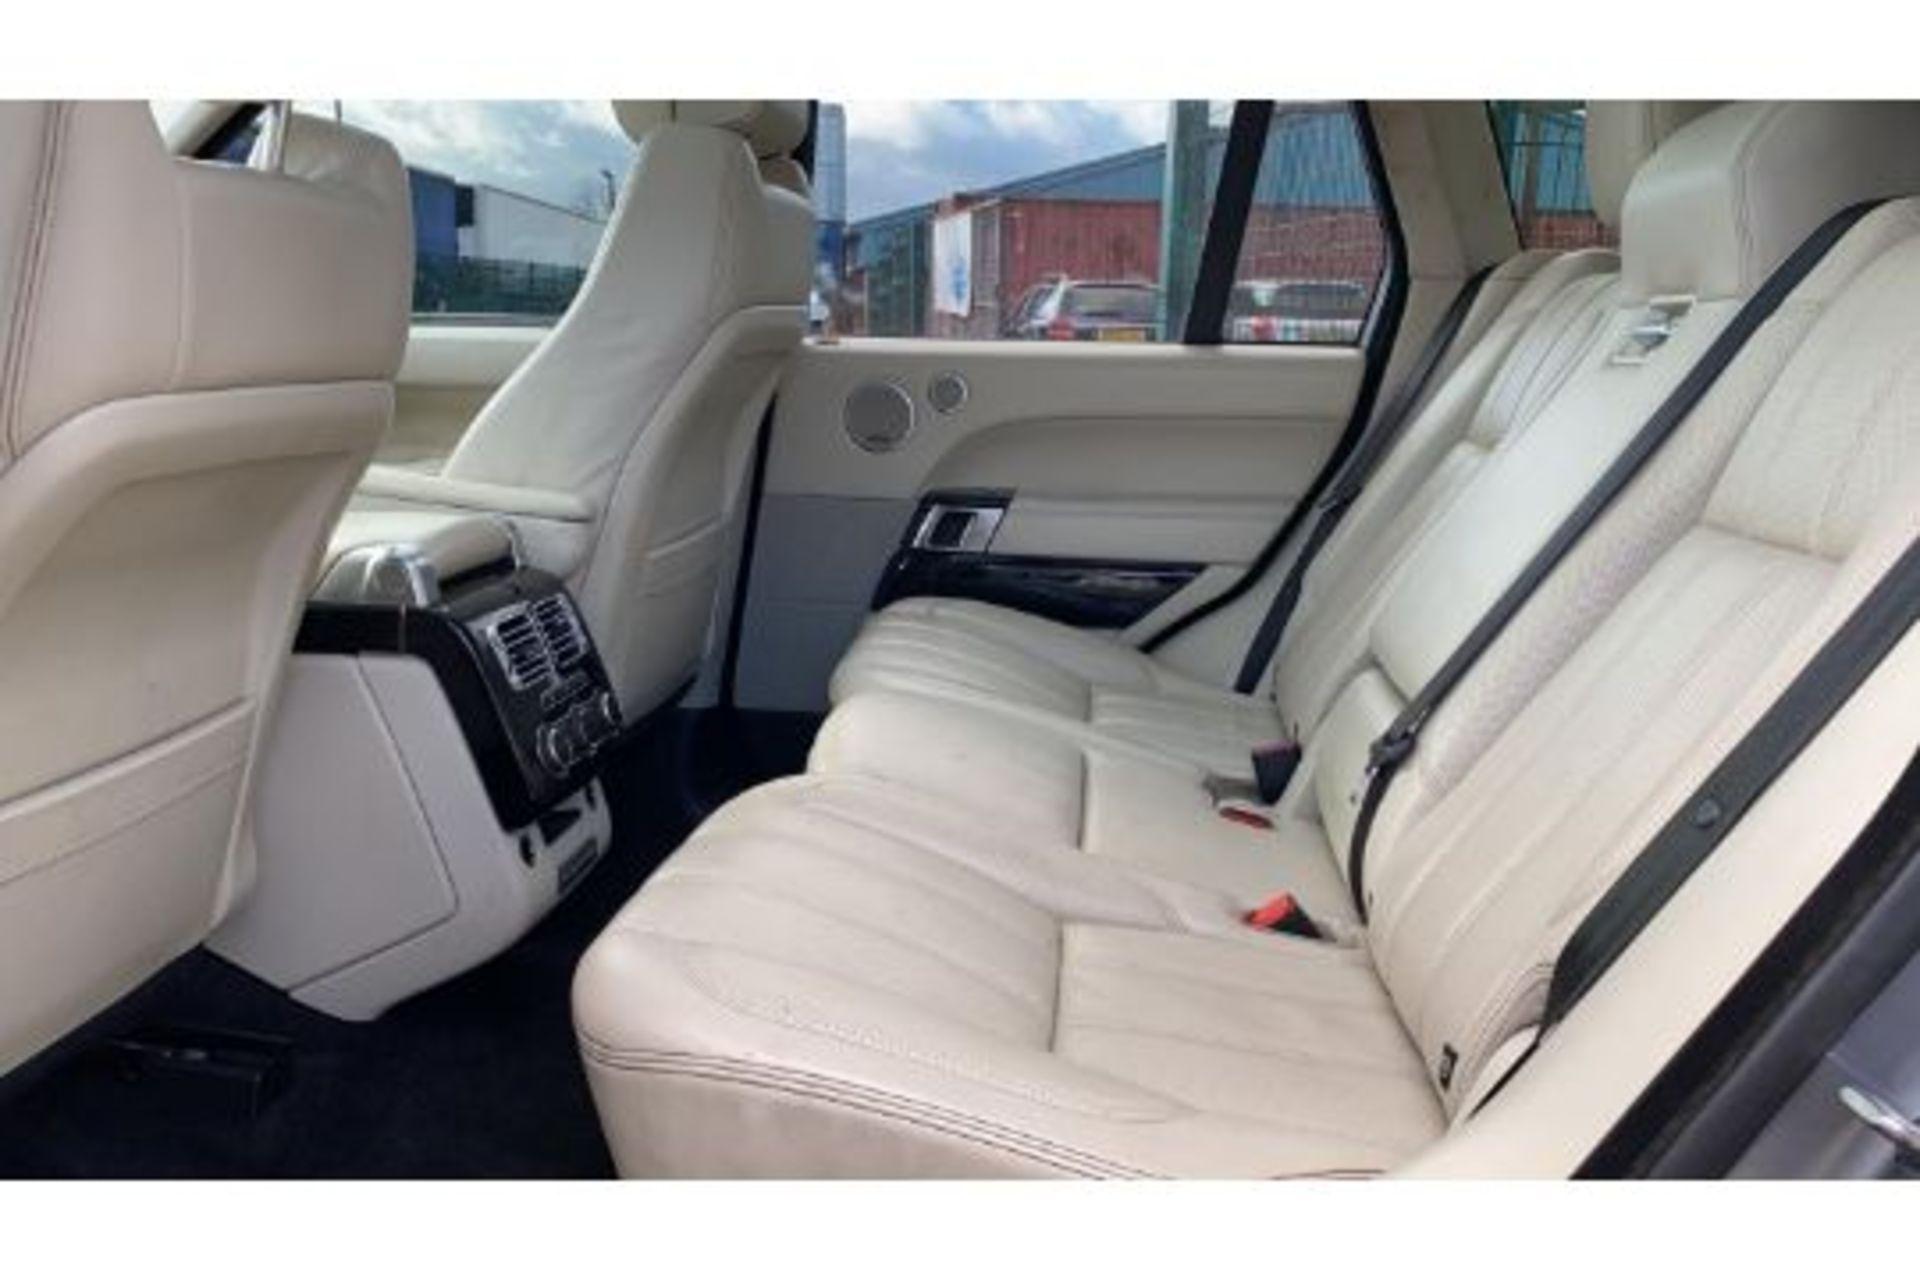 Range Rover Vogue 3.0 TDV6 SE Auto - Black Pack - NEW SHAPE - FULLY LOADED - Pan Roof - Image 16 of 30